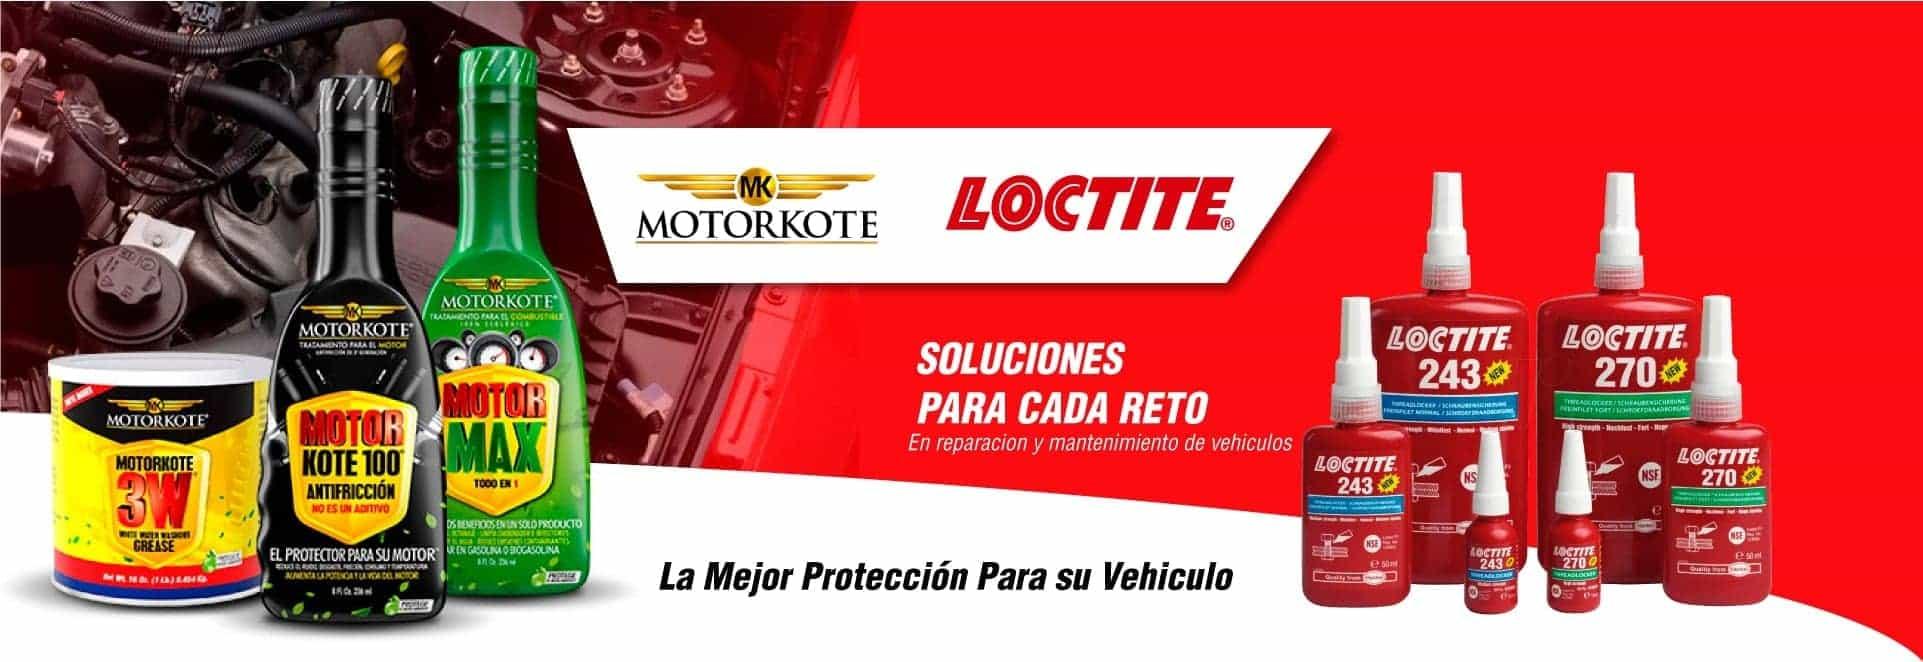 slider13-LOCTITE-MOTORKOTE